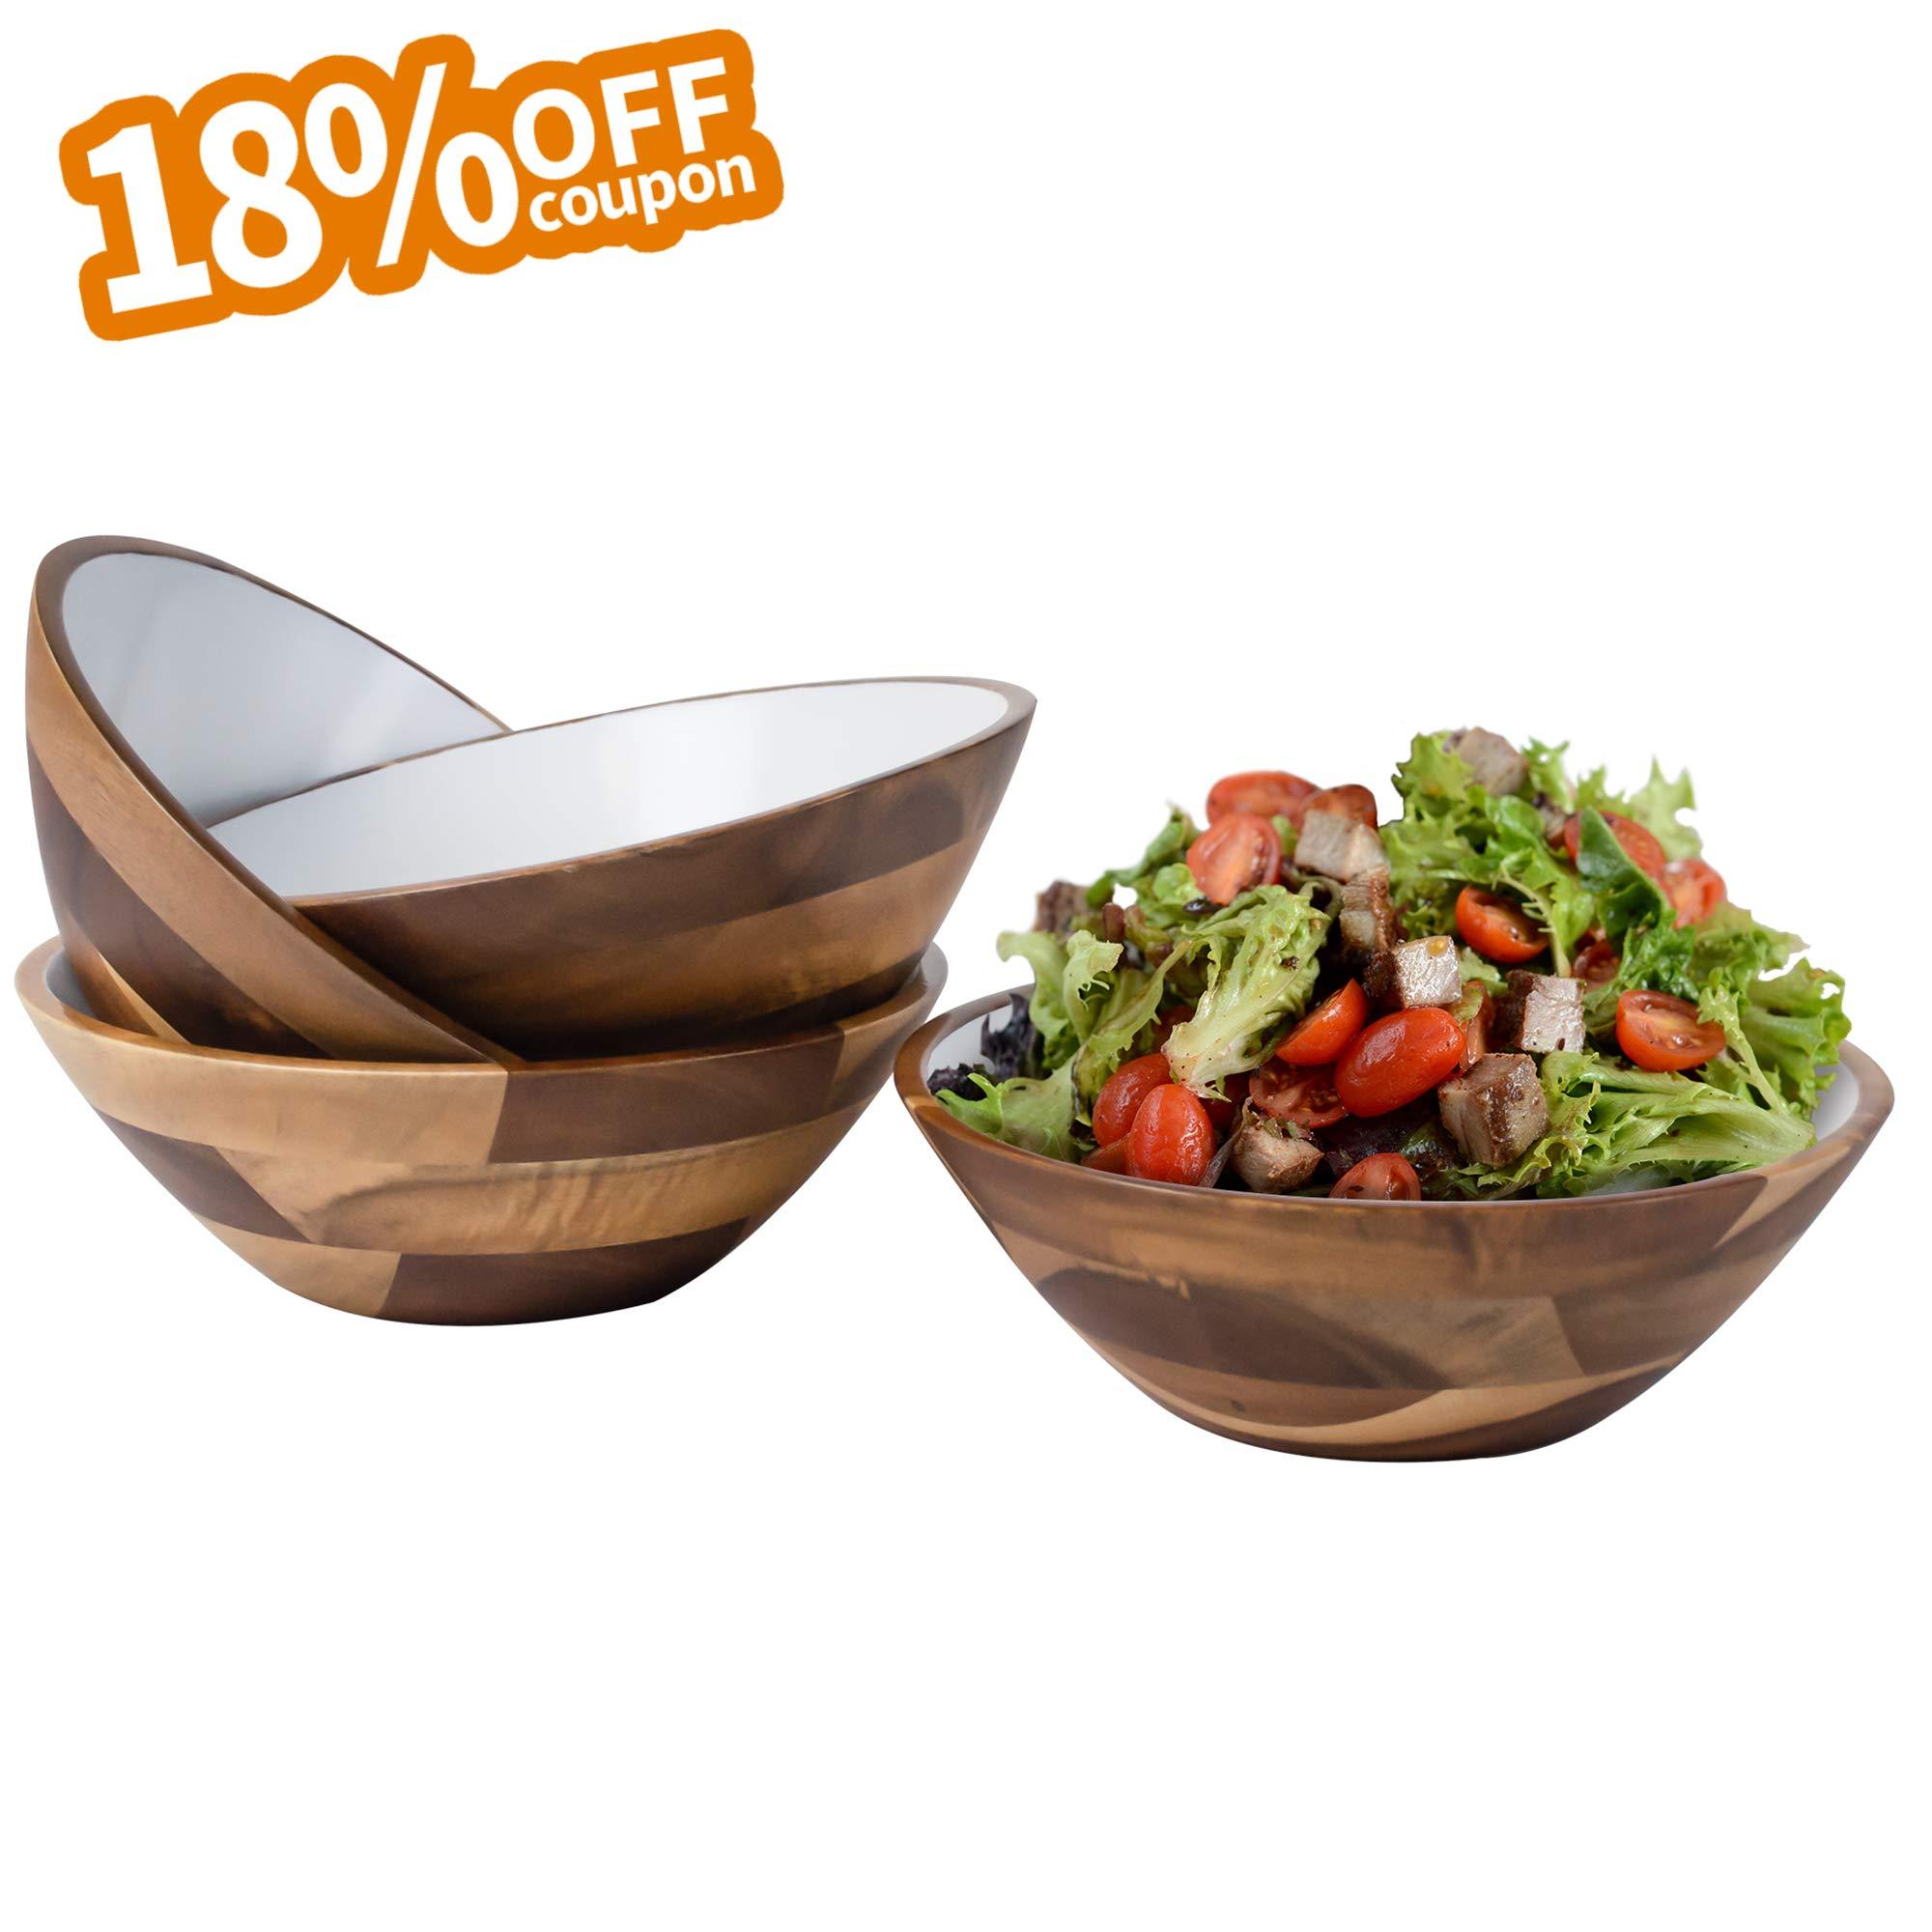 Aidea 7-Inch Acacia Wooden Salad Bowls - Set of 4 Bowls for Cereal Fruit Pasta, Acacia Wood Bowl Set,White